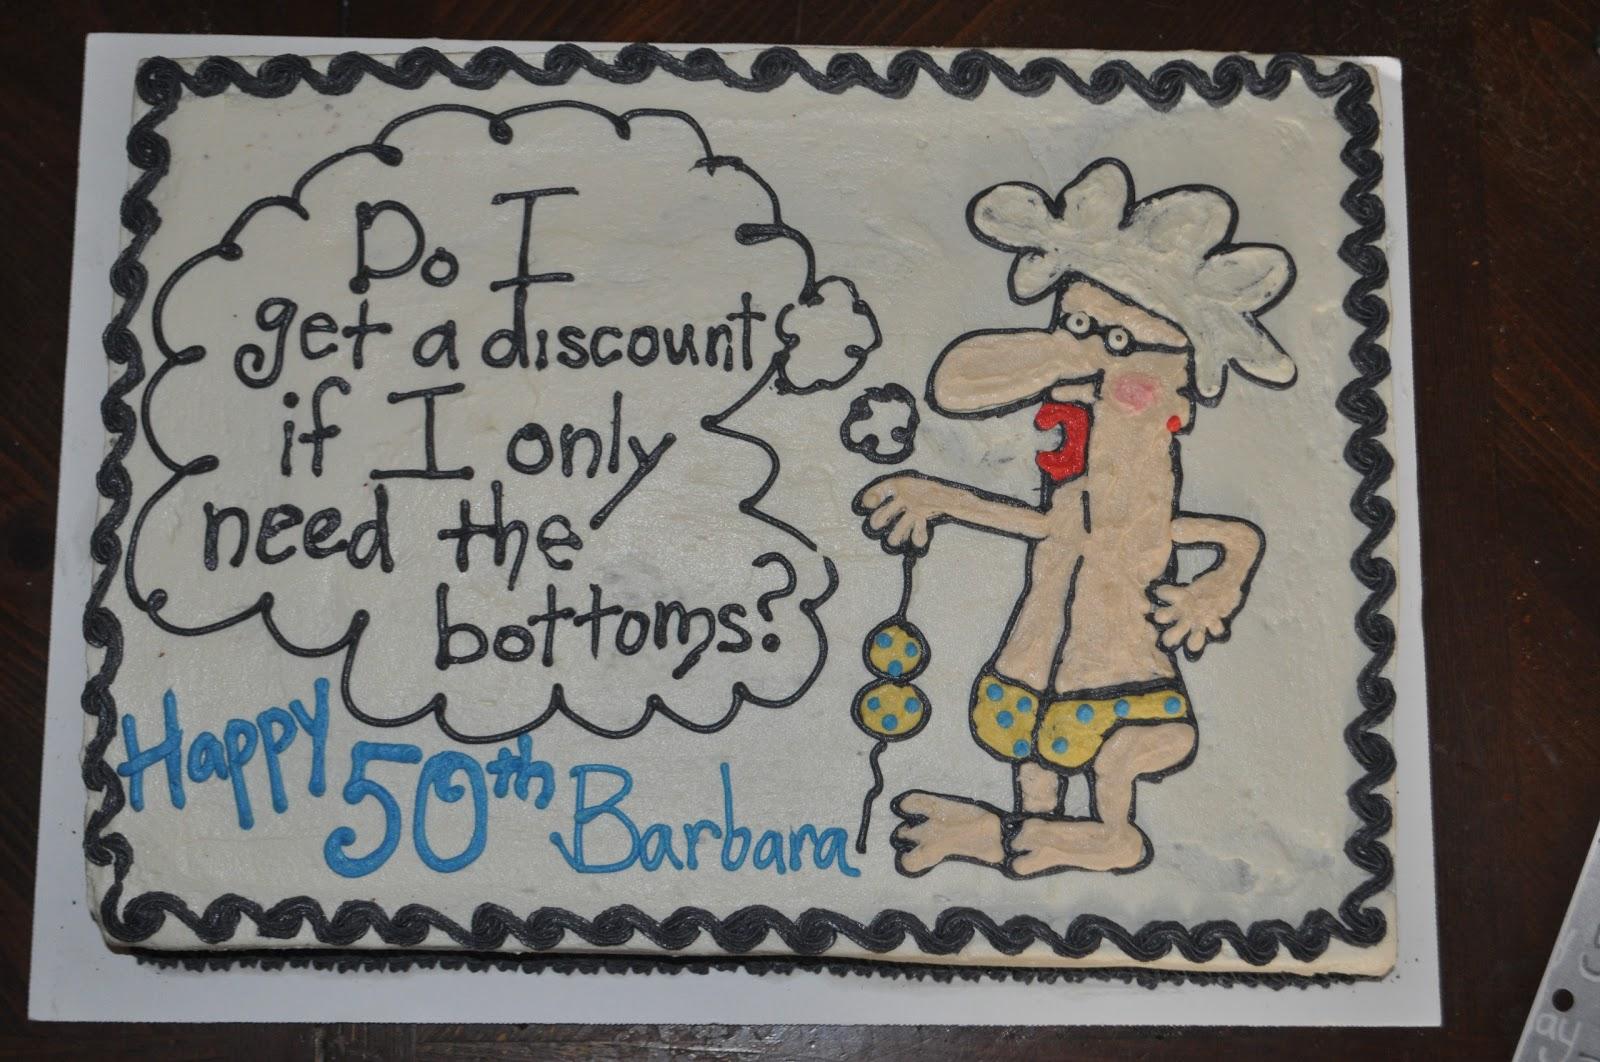 Stupendous Funny Birthday Quotes For Men Over 50 Quotesgram Personalised Birthday Cards Veneteletsinfo